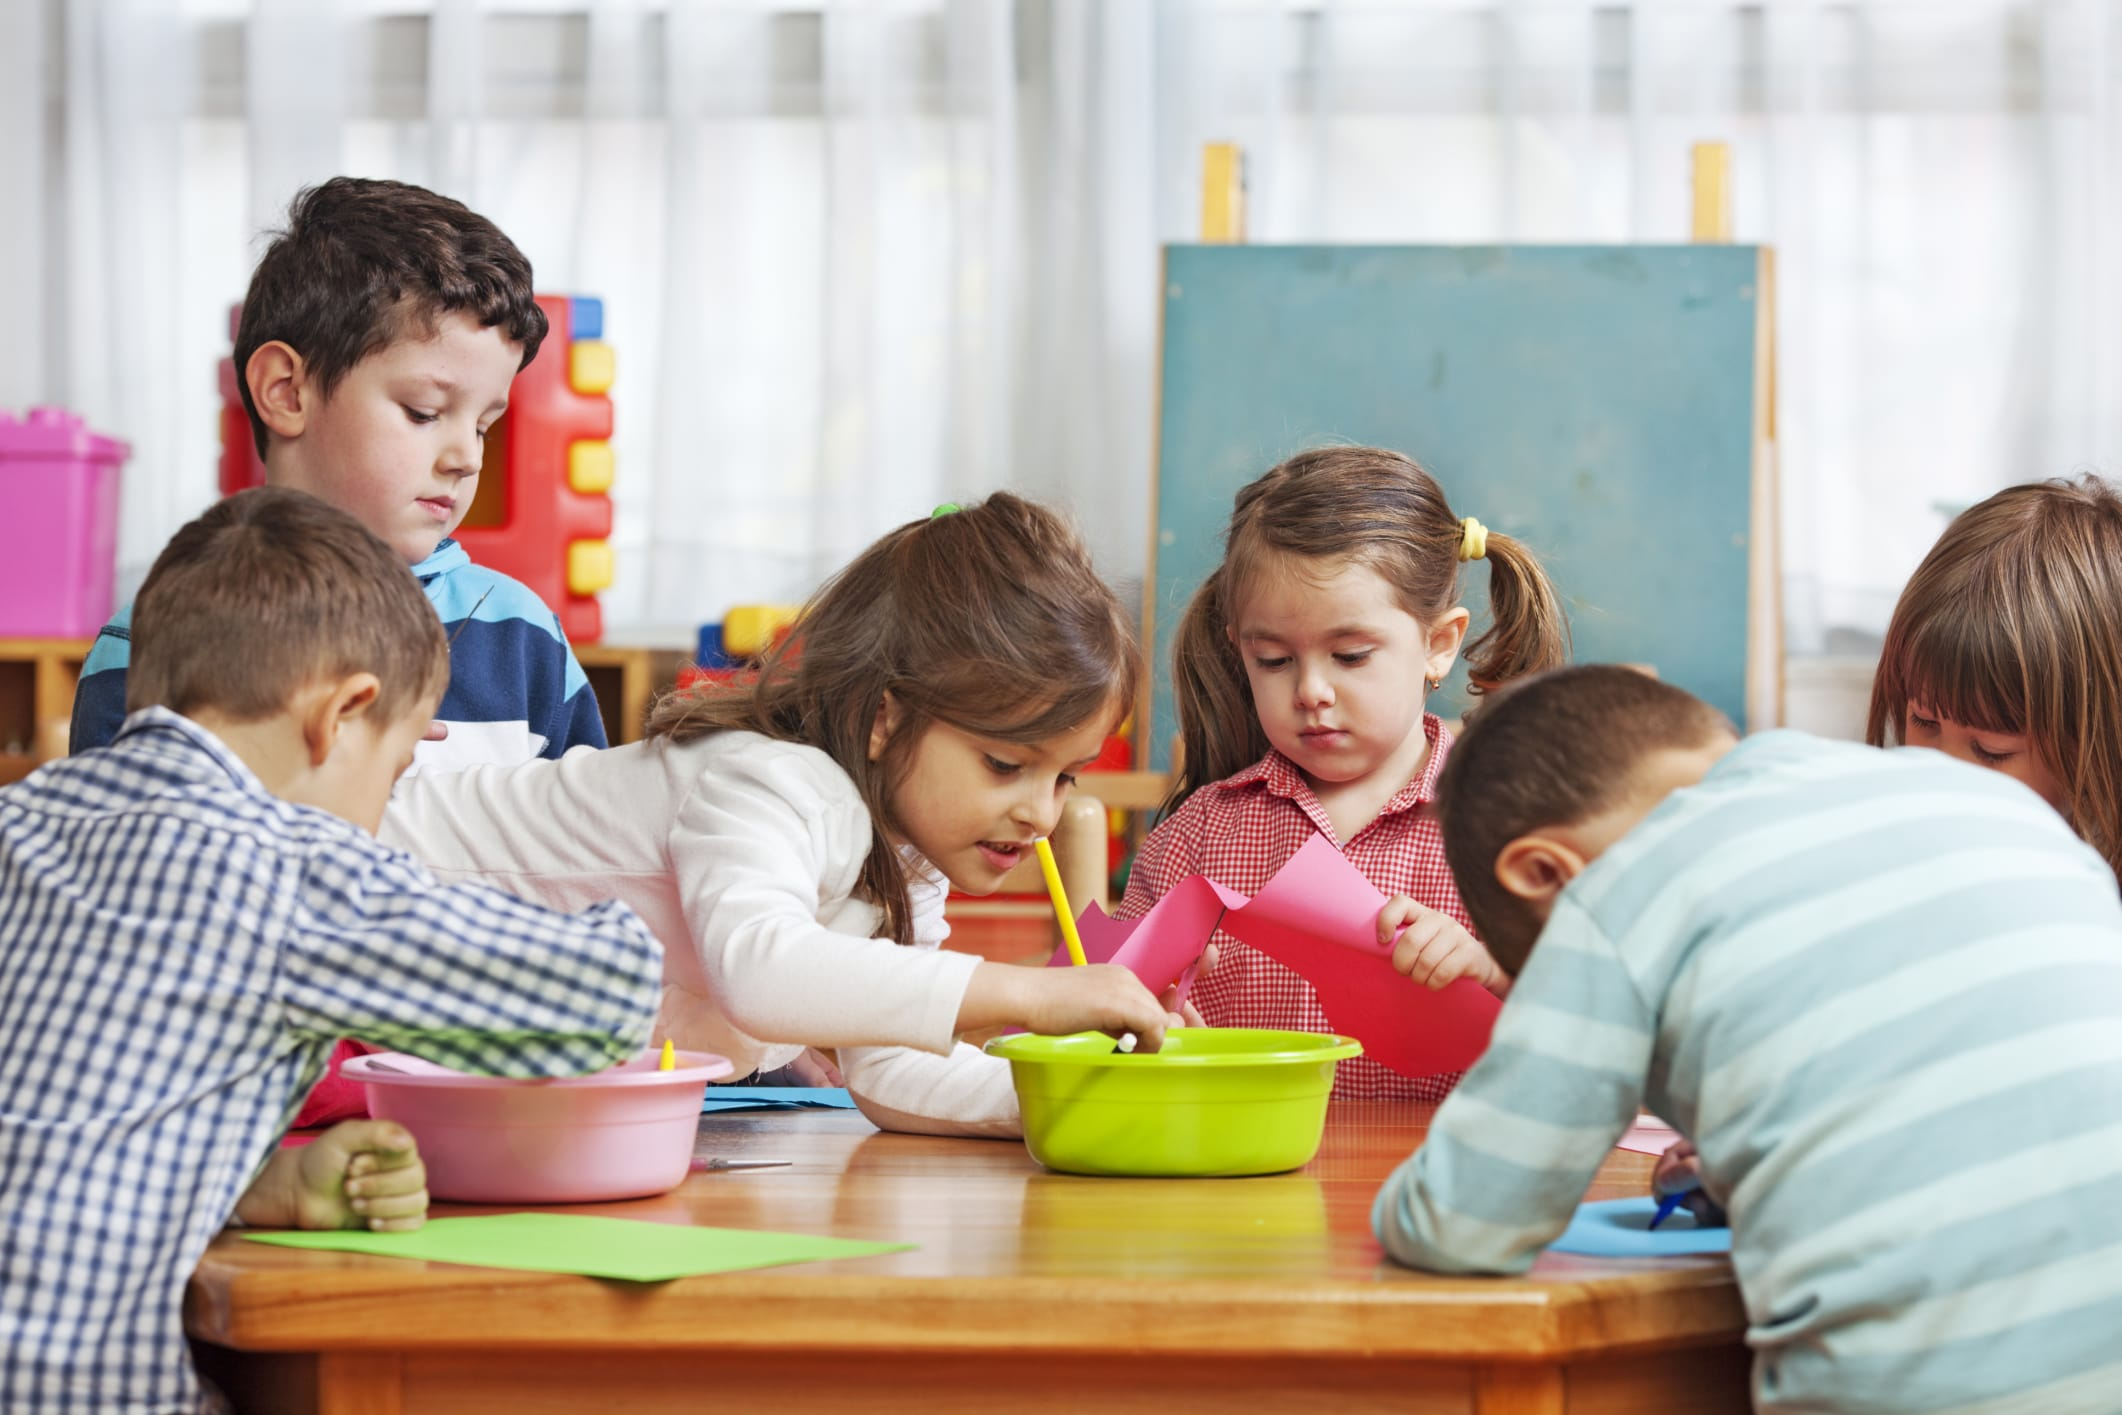 Aria pulita in classe: secondo una ricerca aprire le finestre riduce assenze malattie studenti